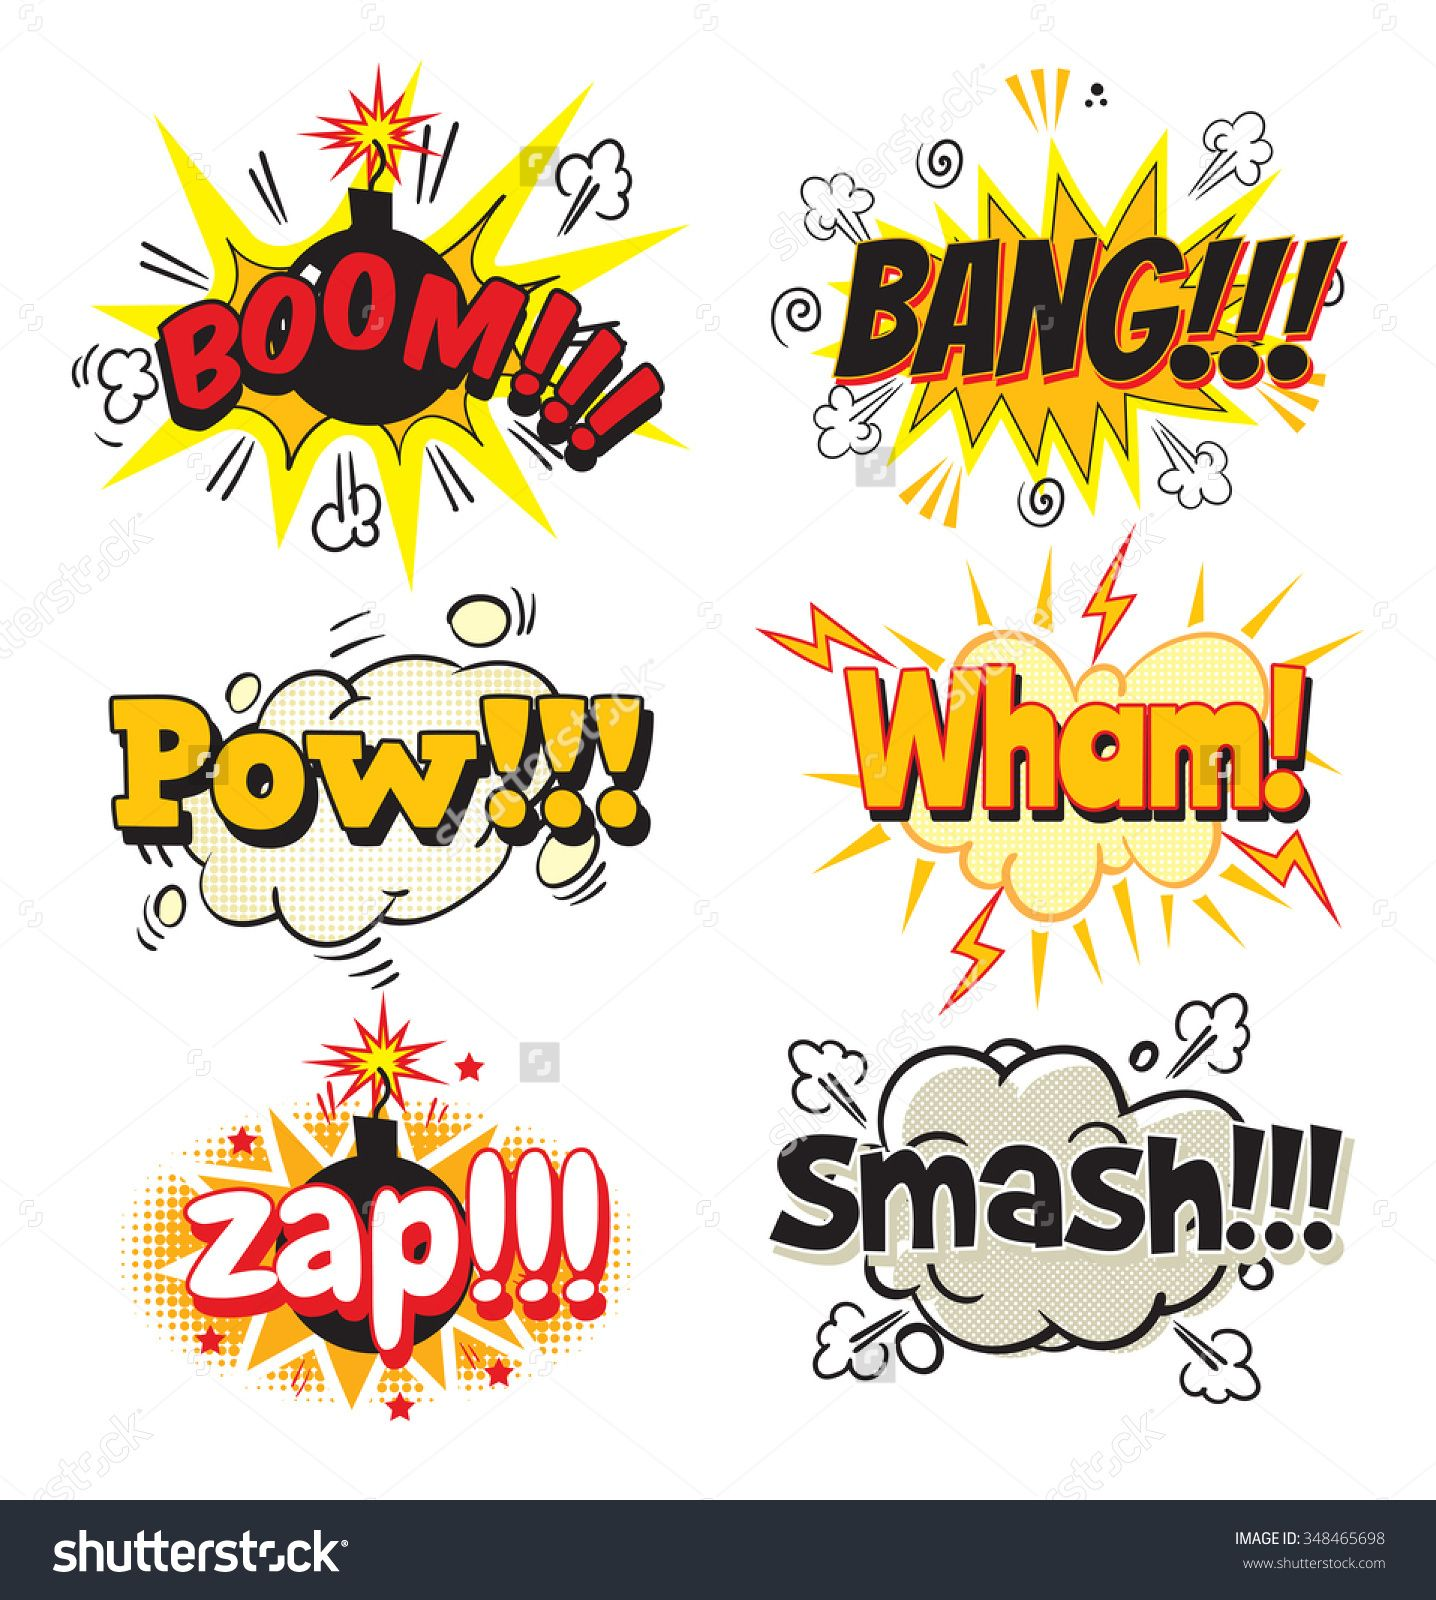 boom bang pow wham zap smash bubble template for comics pop